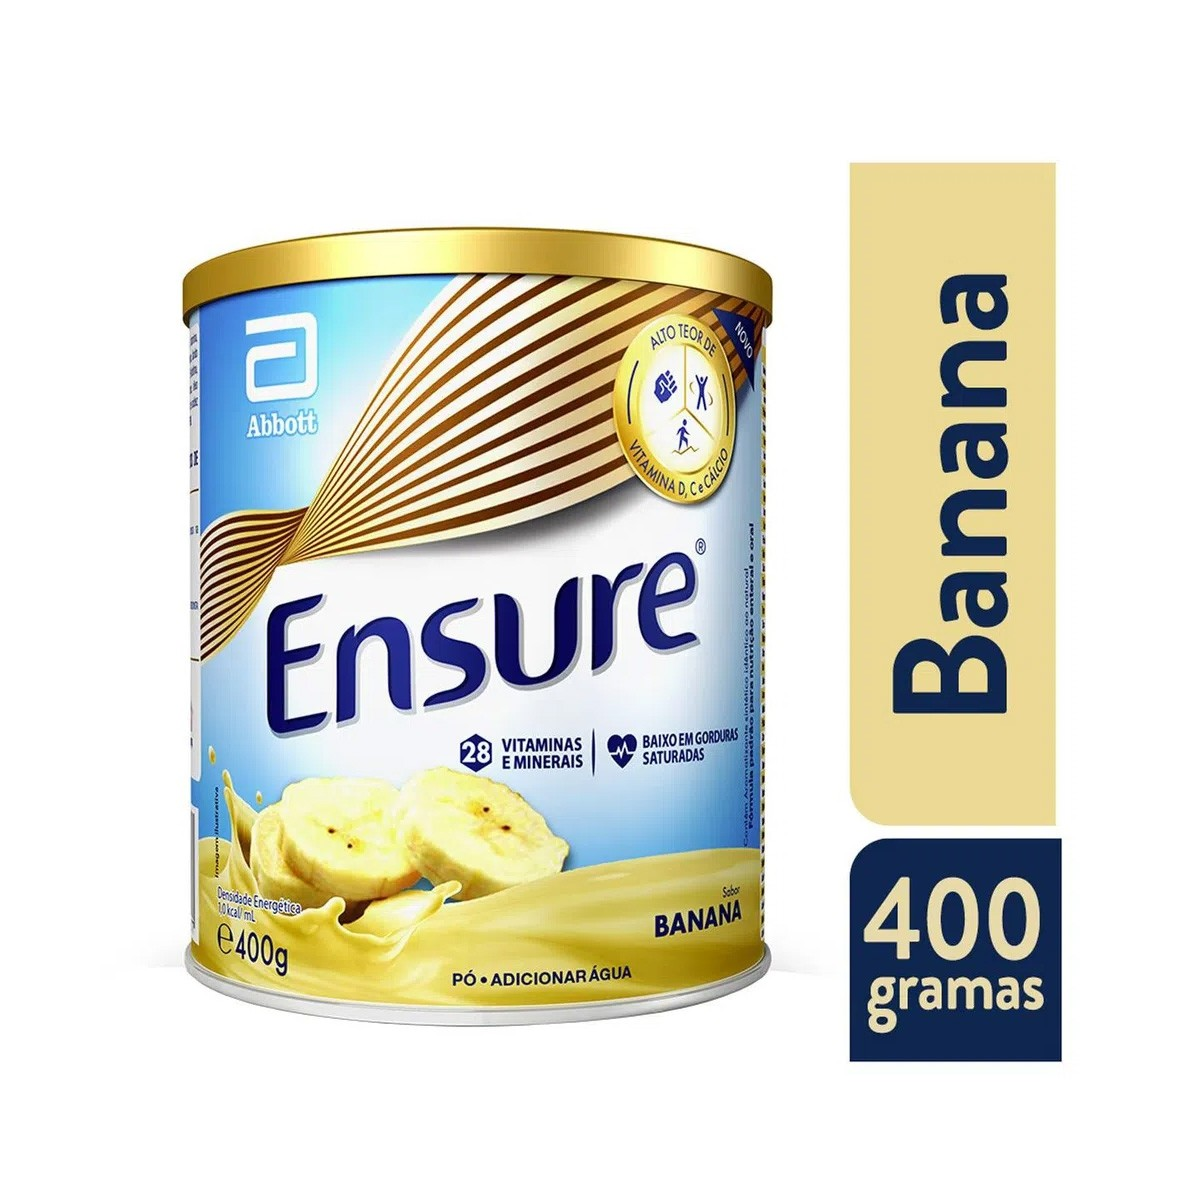 Ensure Banana 400g - Suplemento Alimentar